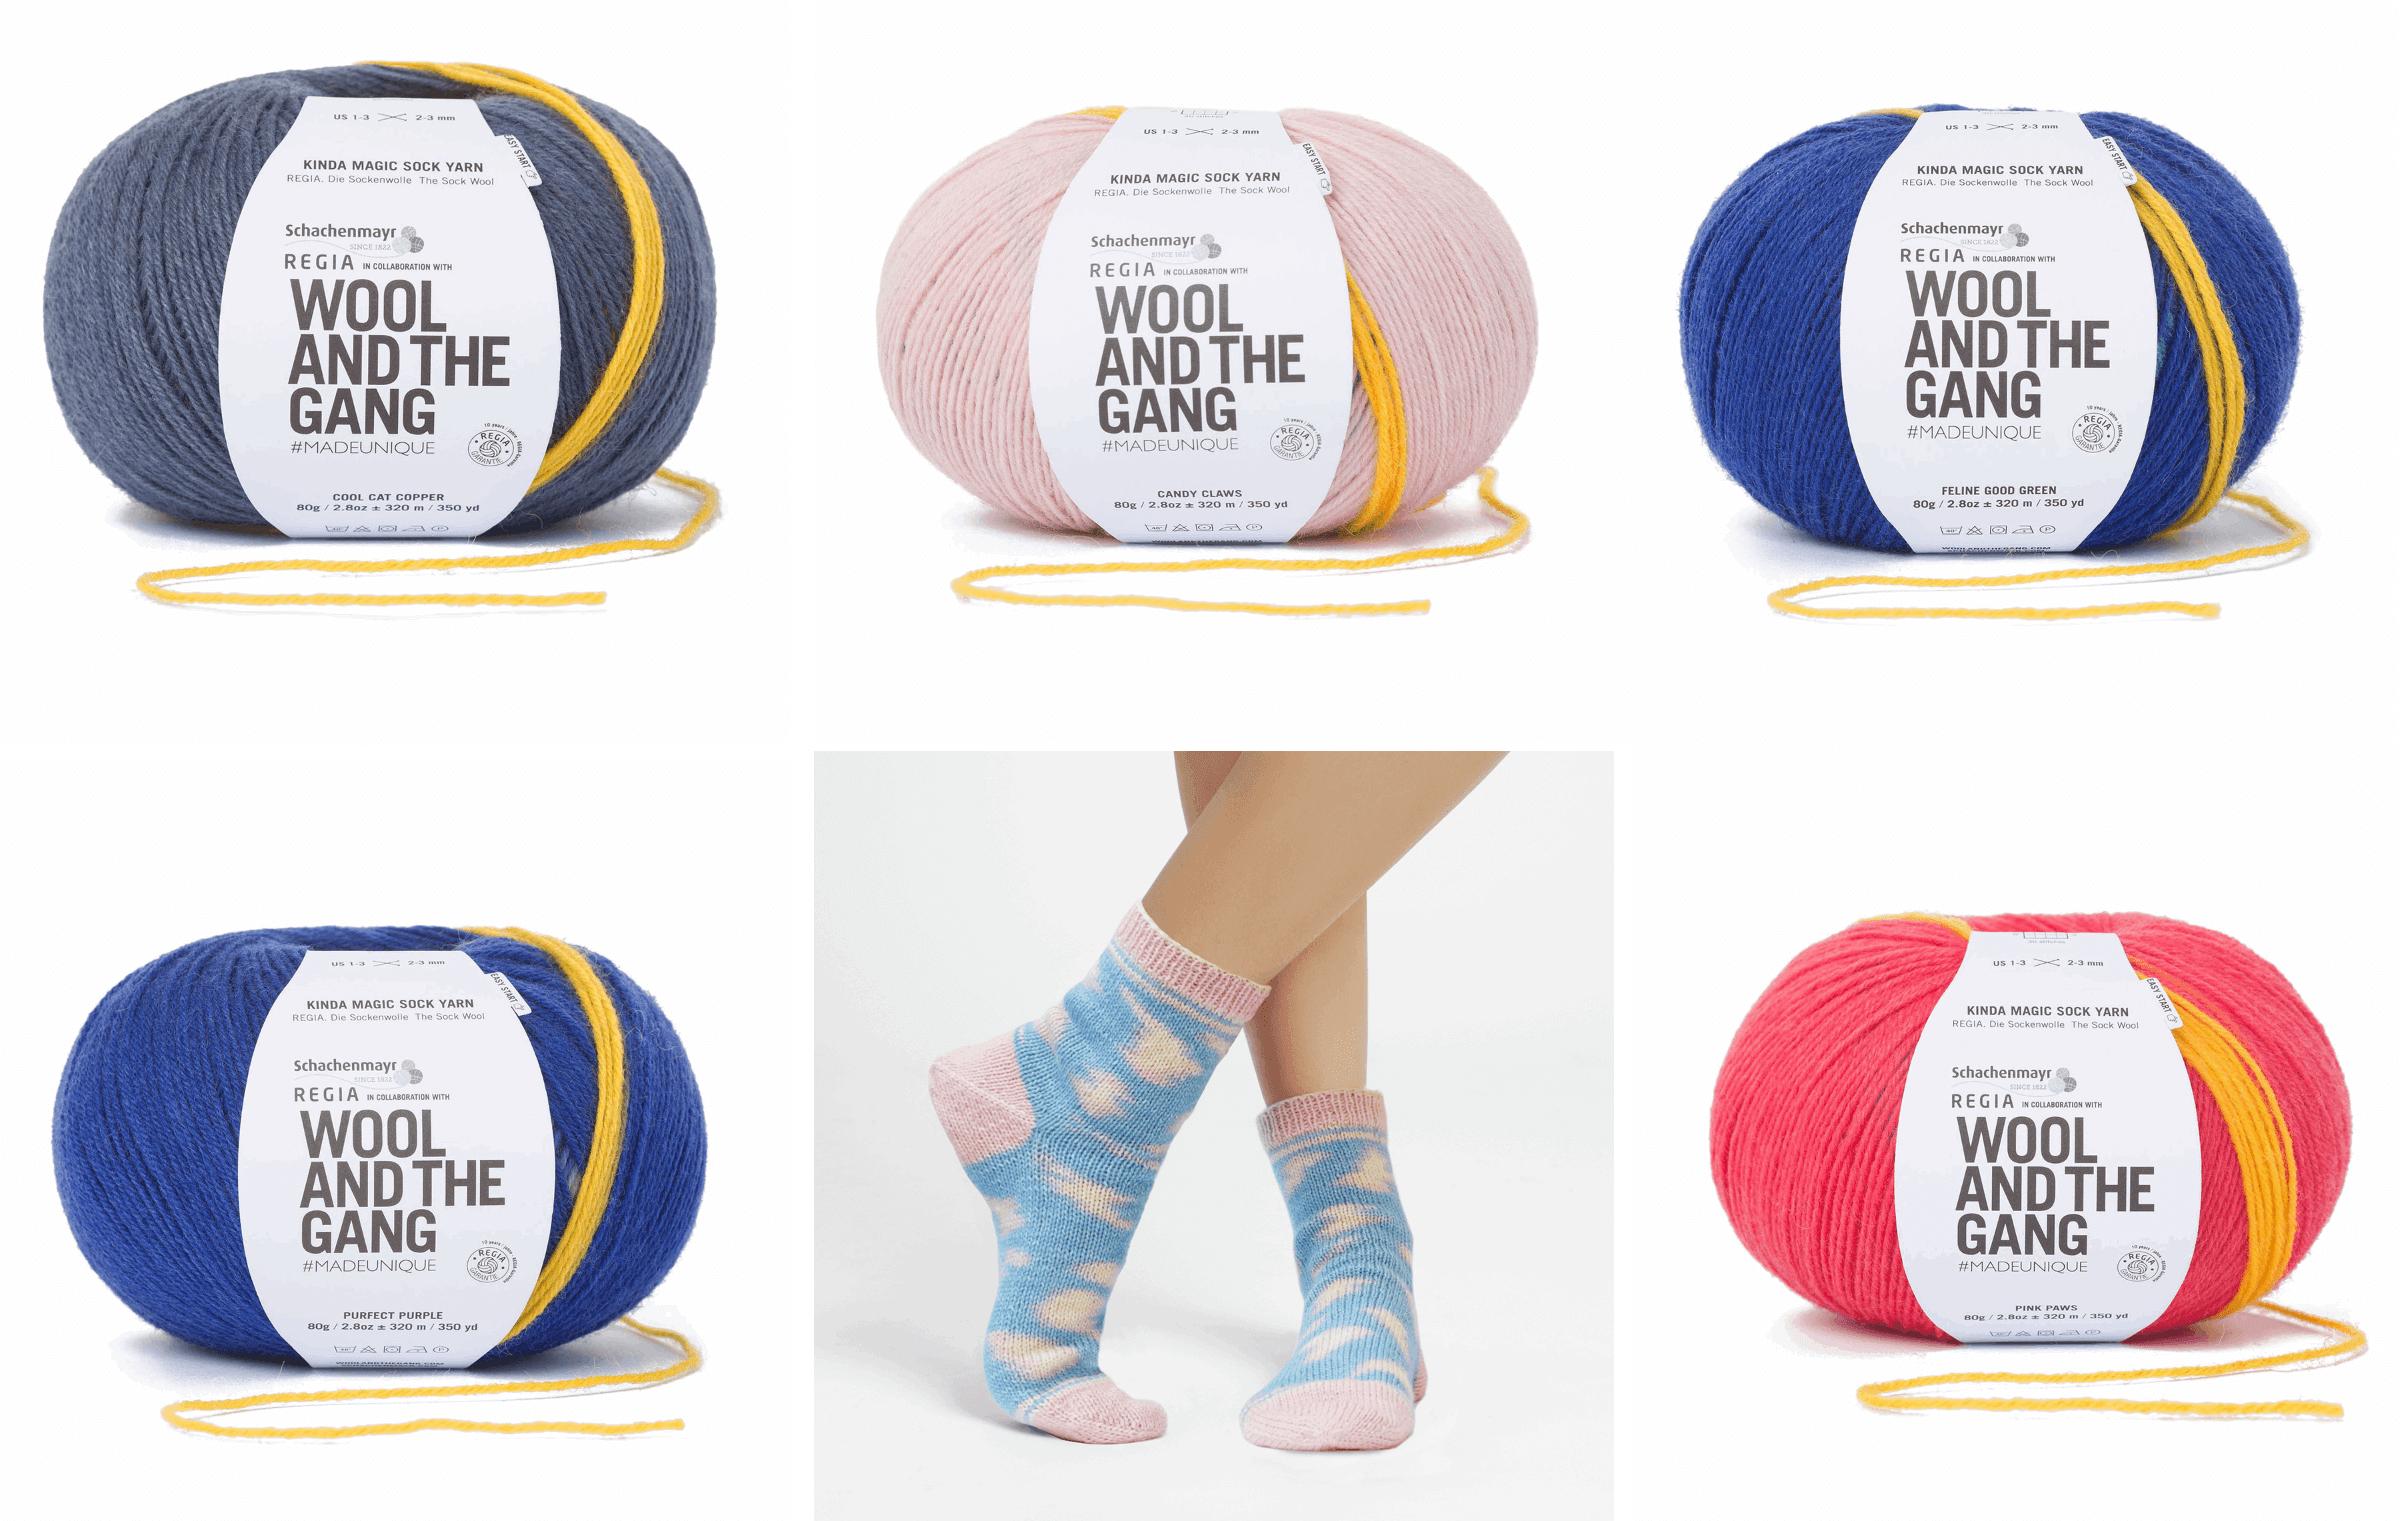 Regia Wool & Gang 4 PLY Kinda Magic Knitting Crochet Yarn Craft Wool 80g Ball 6456 Cool Cat